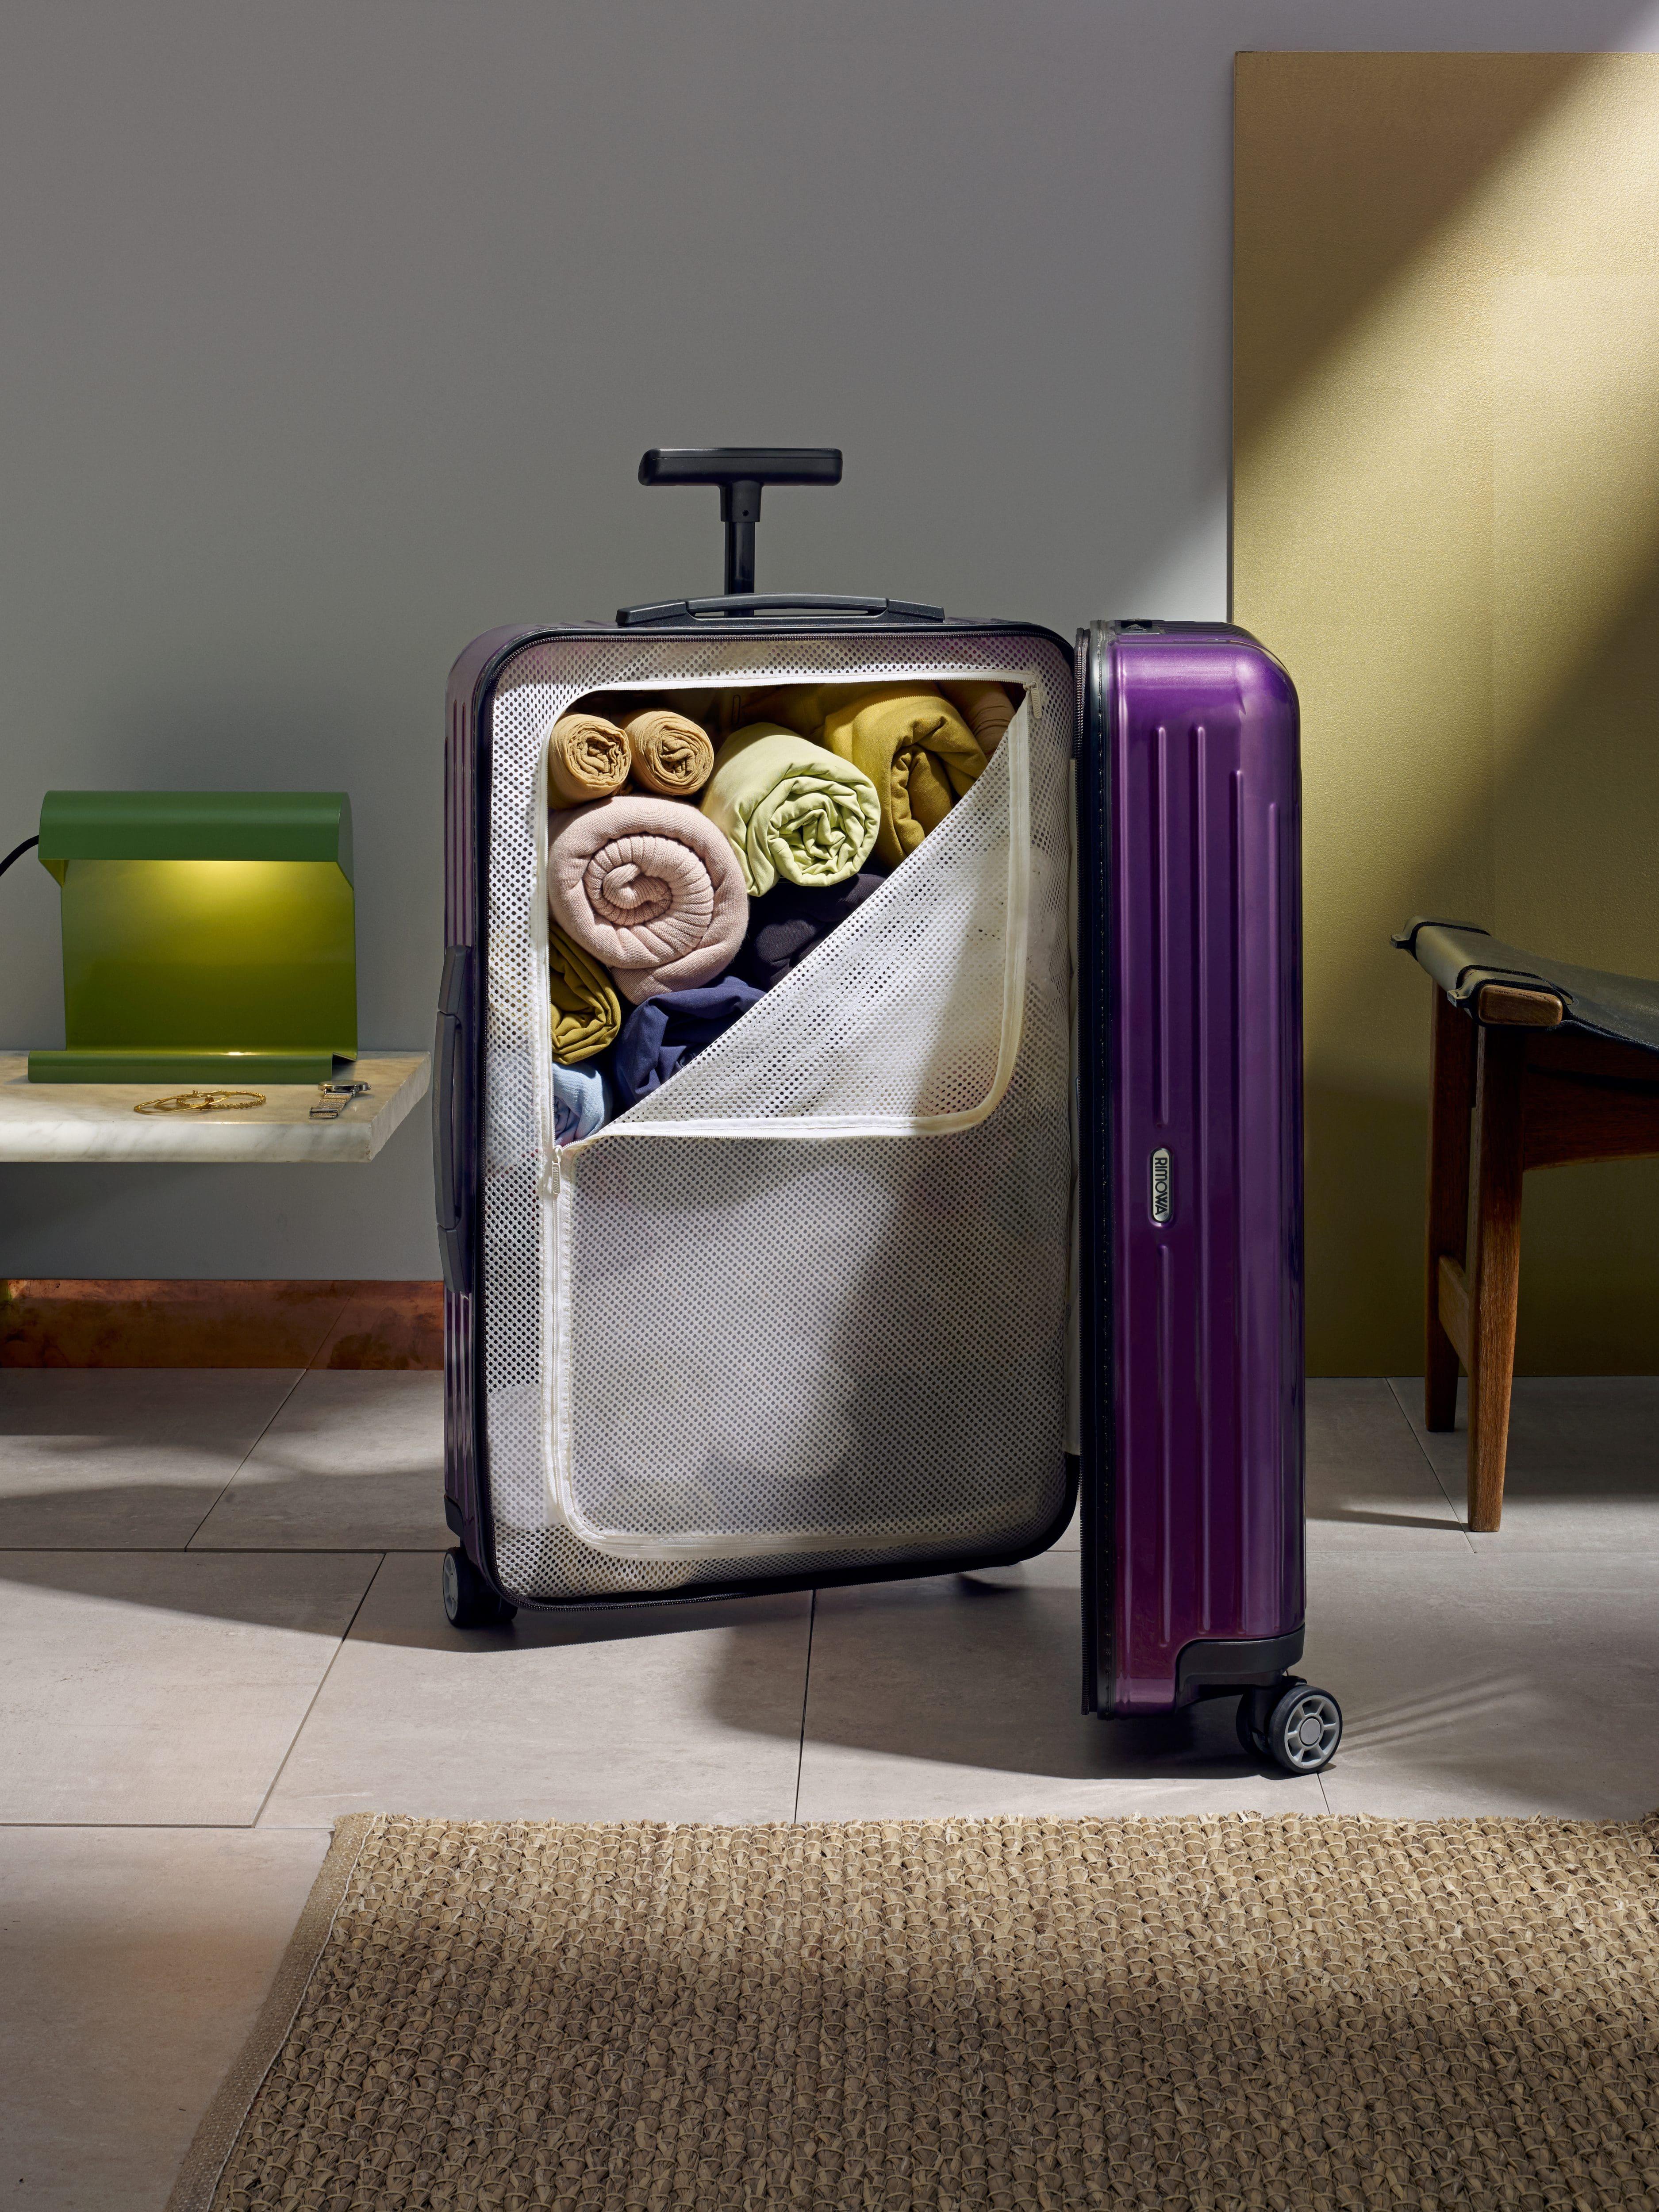 Marie Kondo's suitcase-packing masterclass